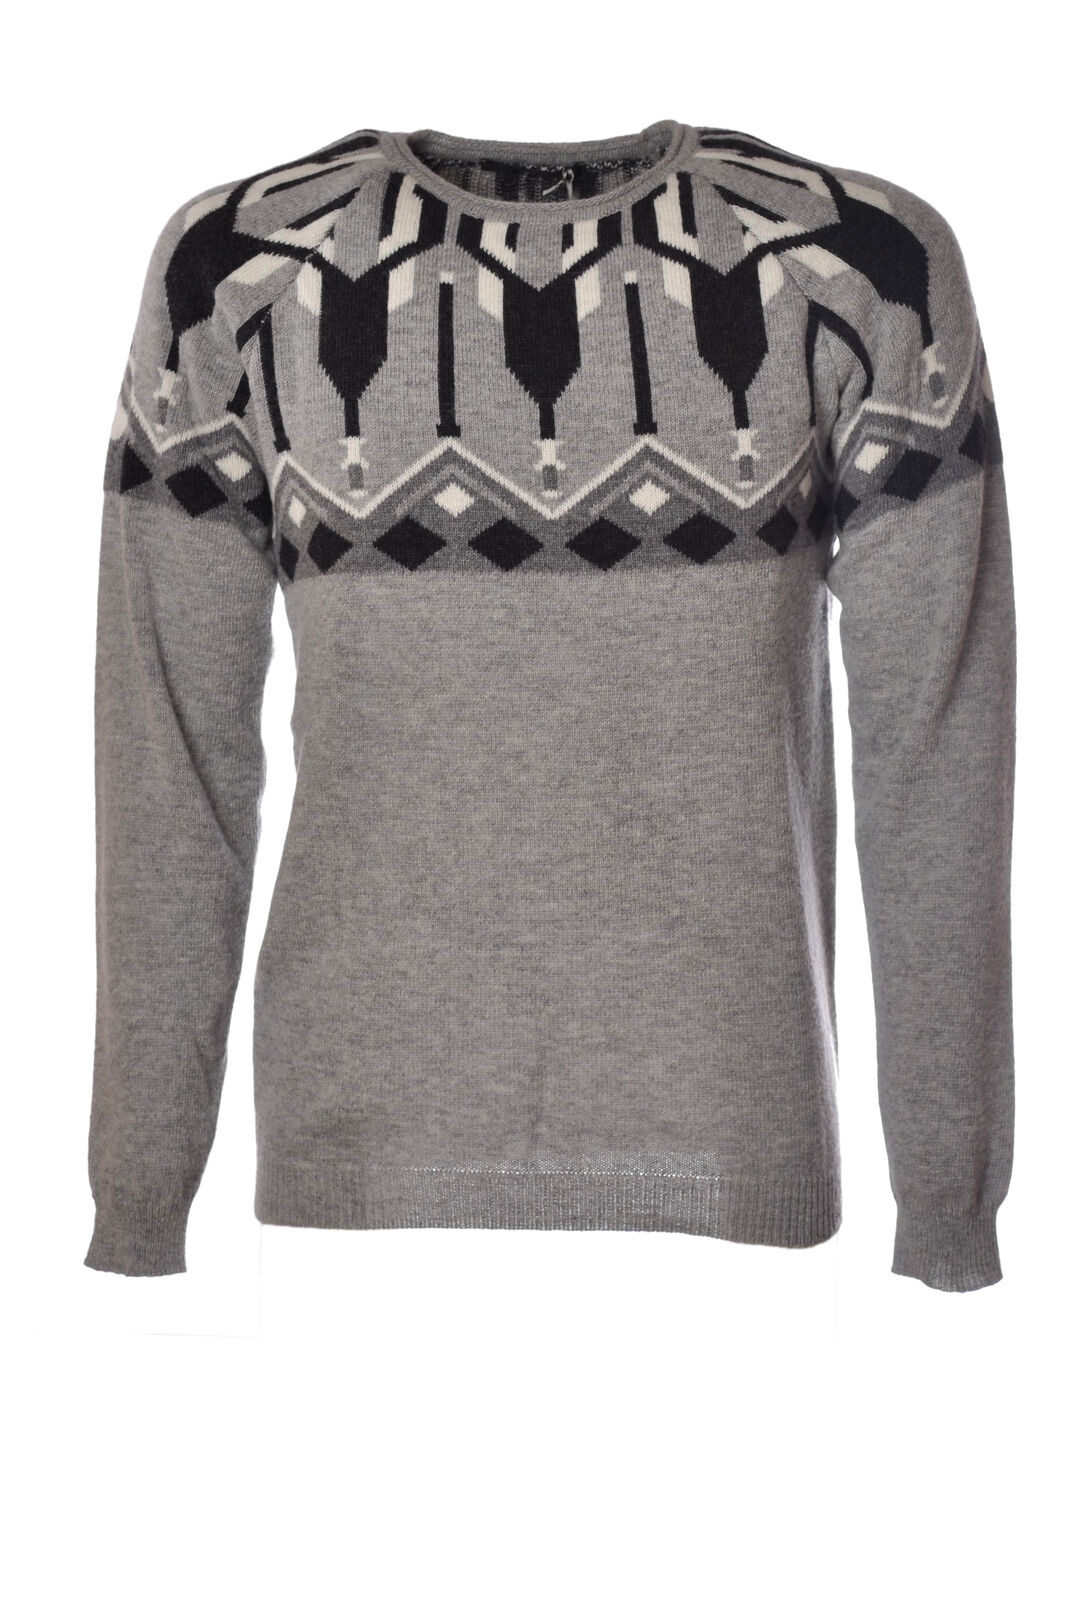 Daniele Alessandrini  -  Sweaters - Male - Fantasy - 2424026N173403